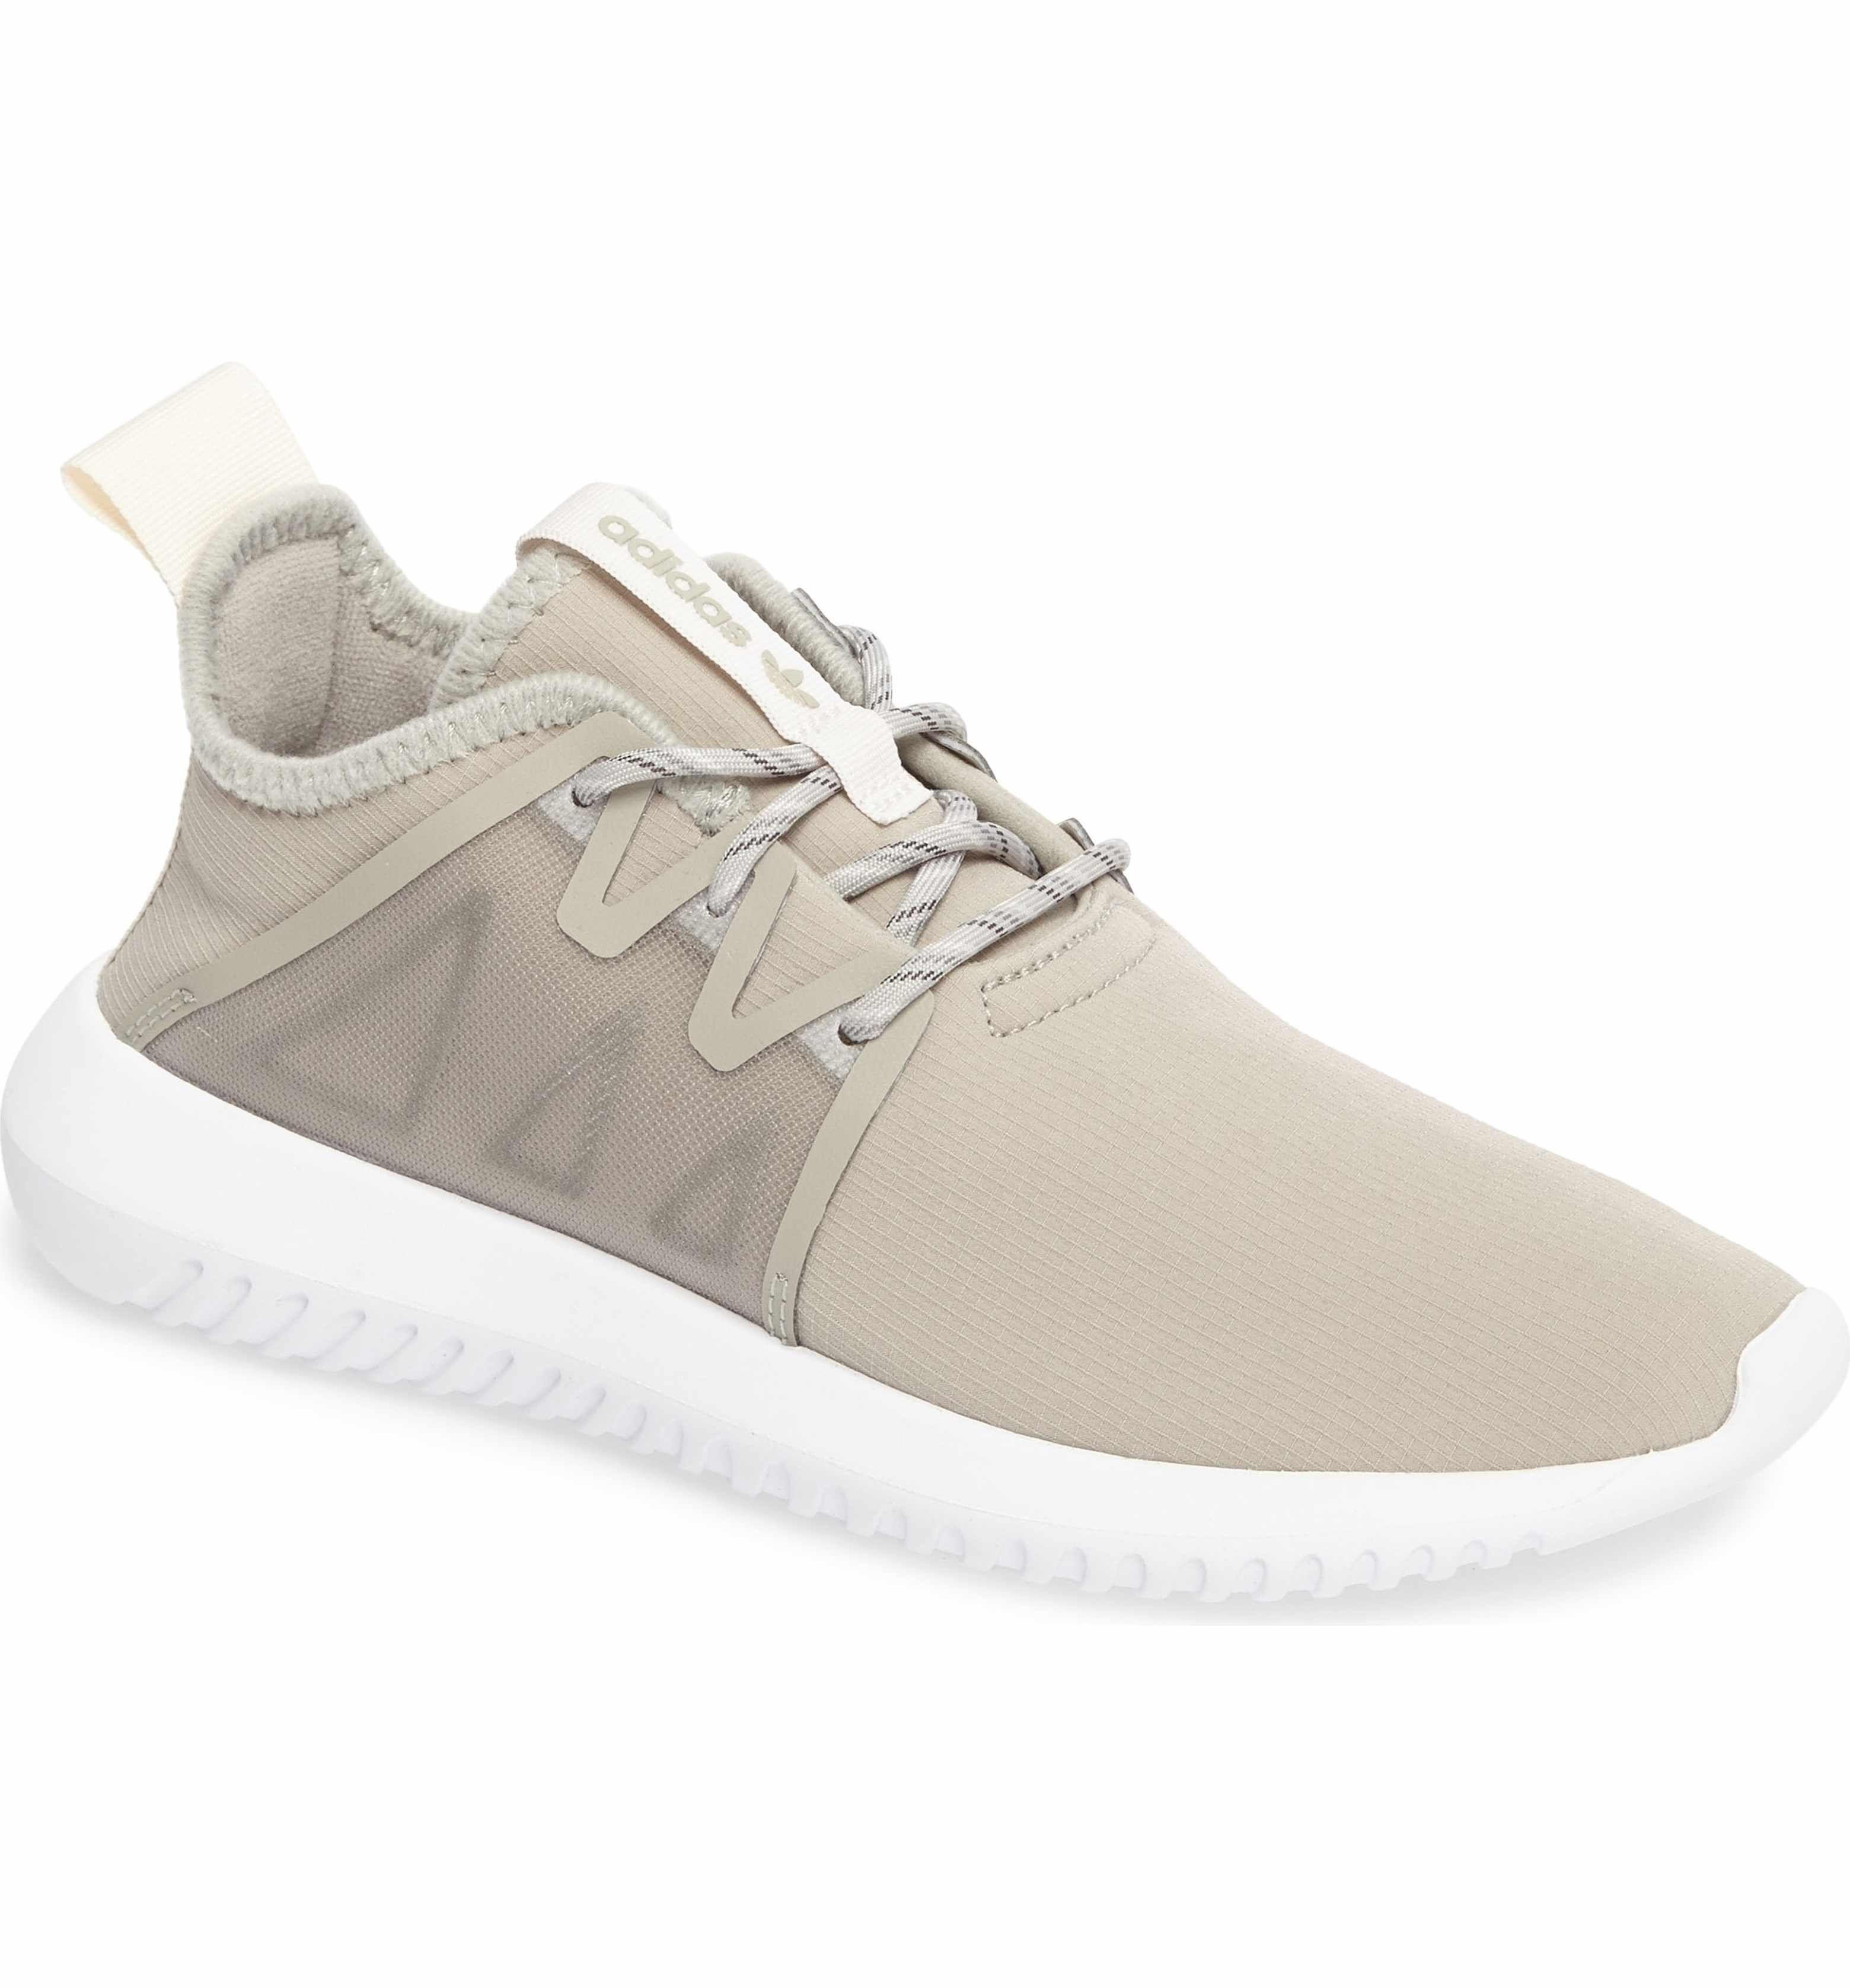 immagine principale adidas tubulare virale 2 scarpa (donne) online